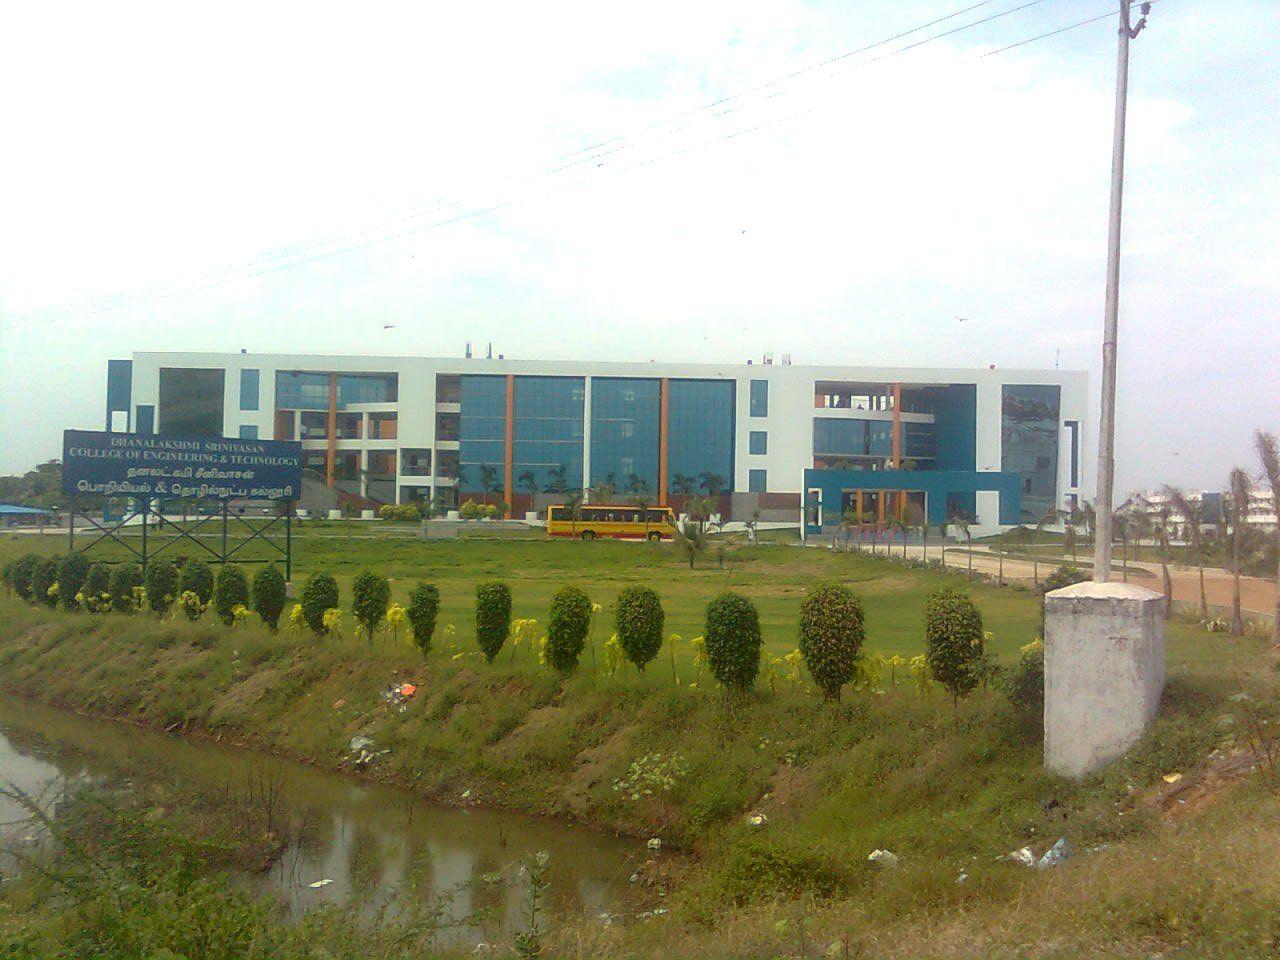 Dhanalakshmi Srinivasan College Of Engineering And Technology, Chennai (DSCET) Kanchipuram